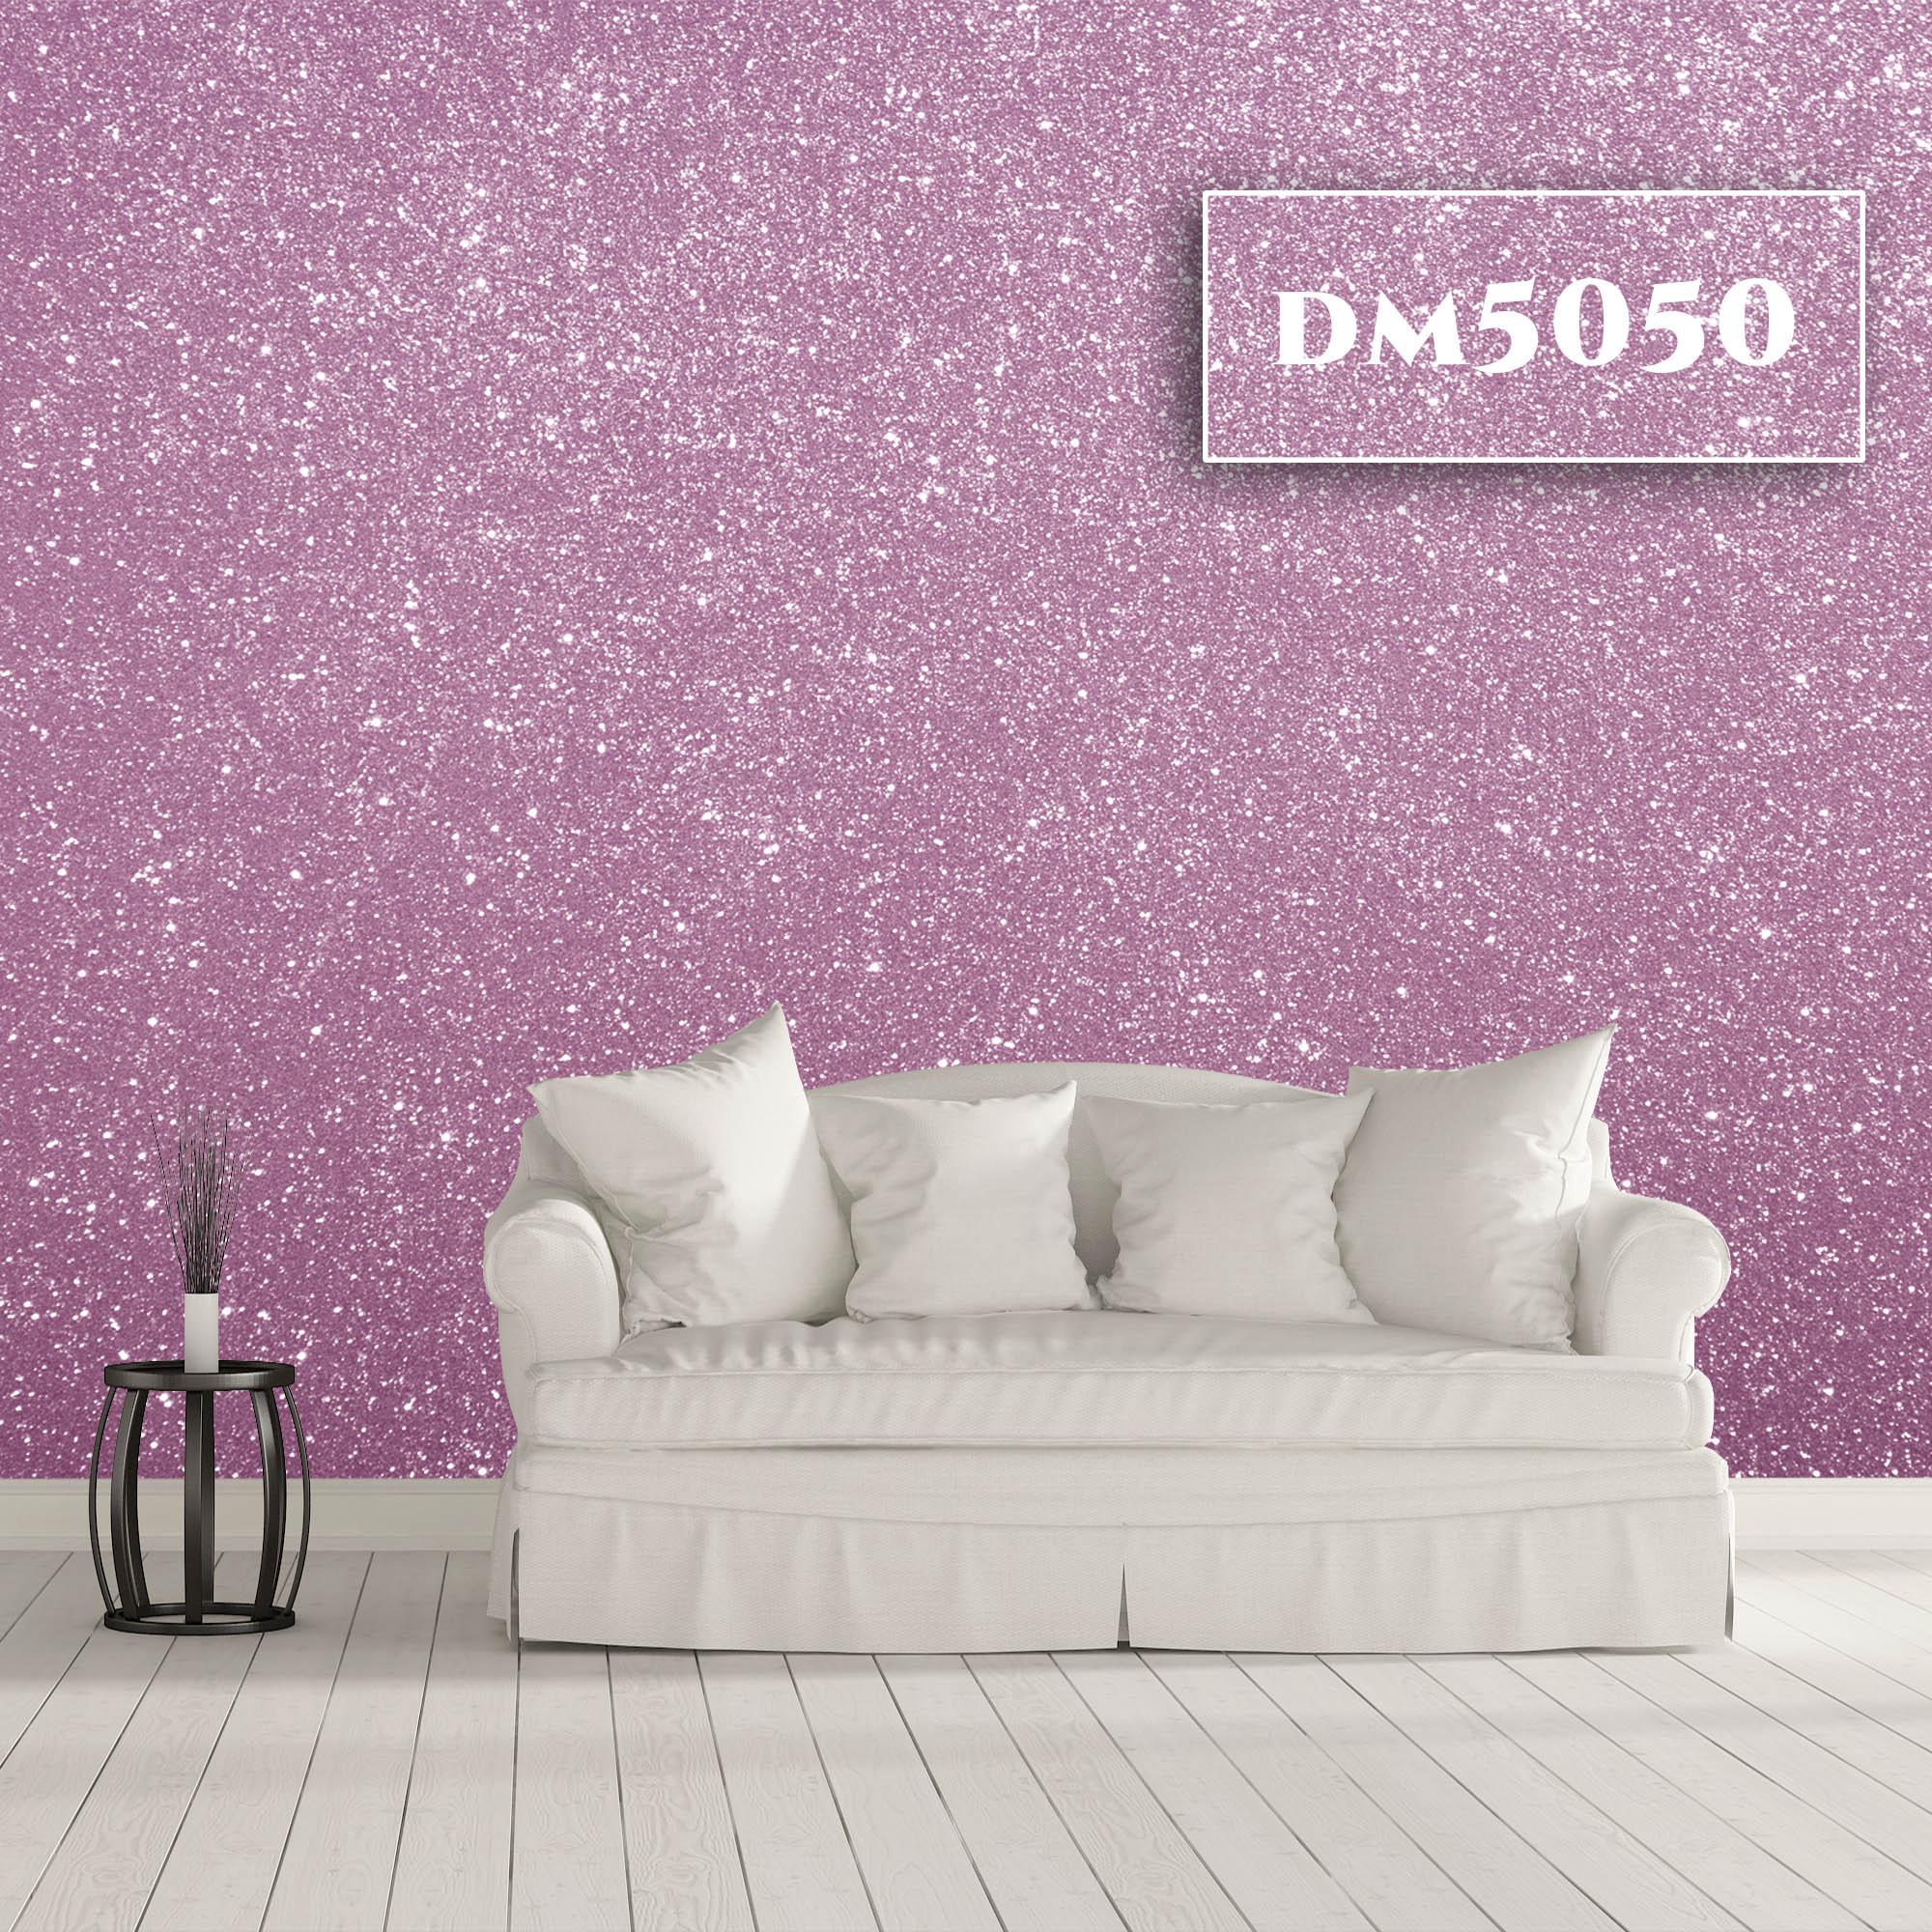 DM5050